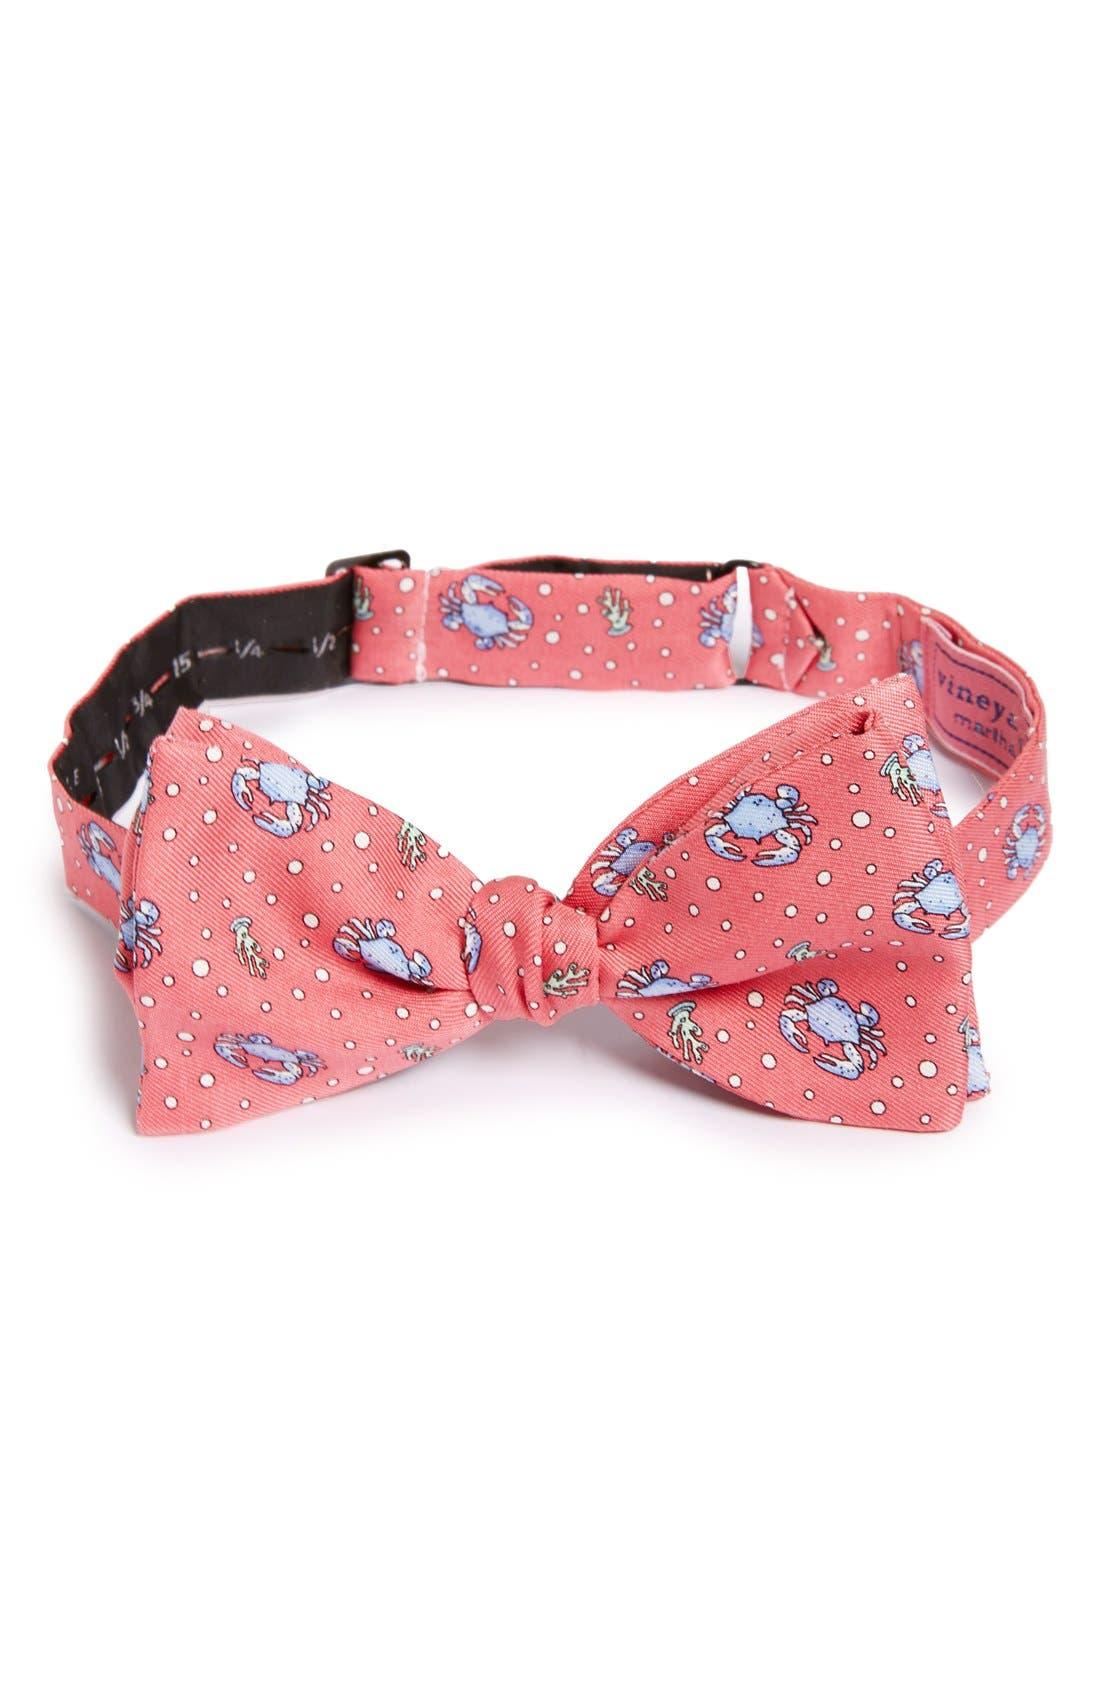 VINEYARD VINES Crab Silk Bow Tie